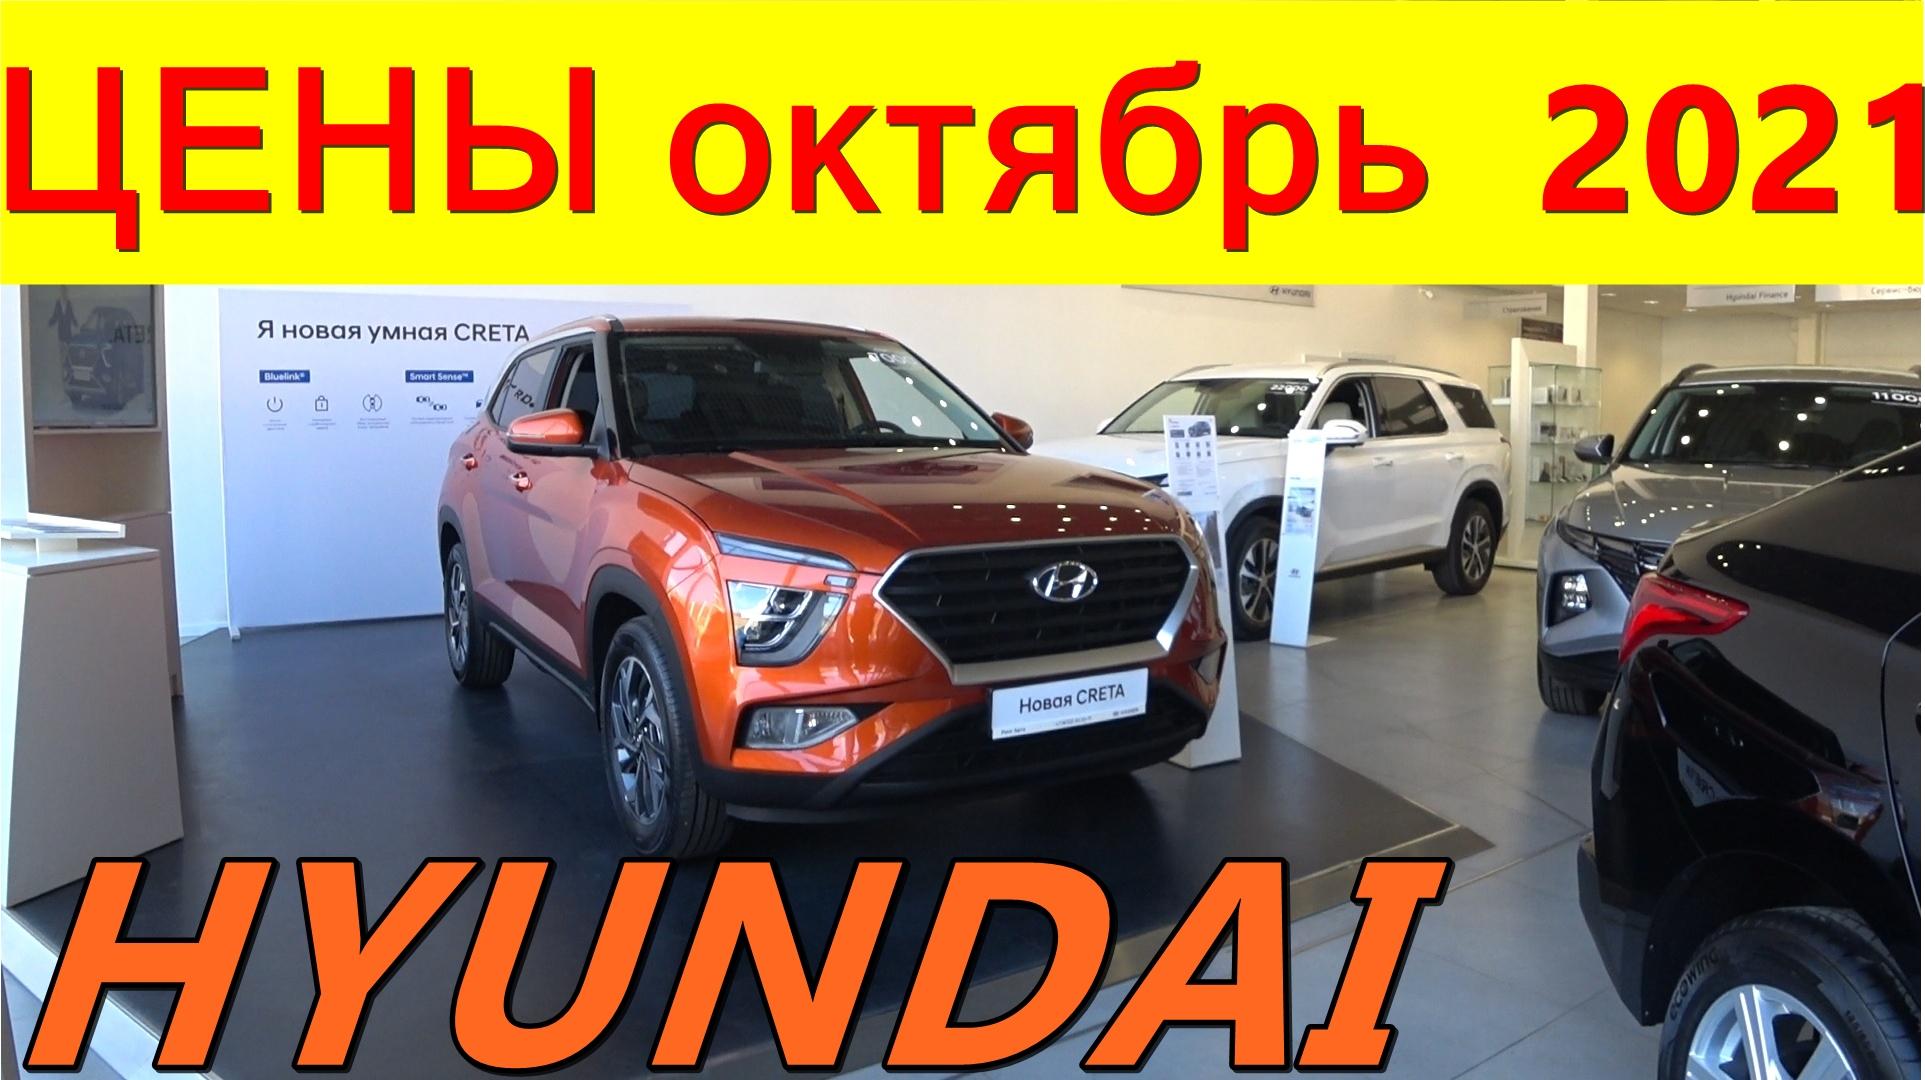 VsyakoRazno-HYUNDAI ЦЕНЫ октябрь 2021 реальные цены-22.10